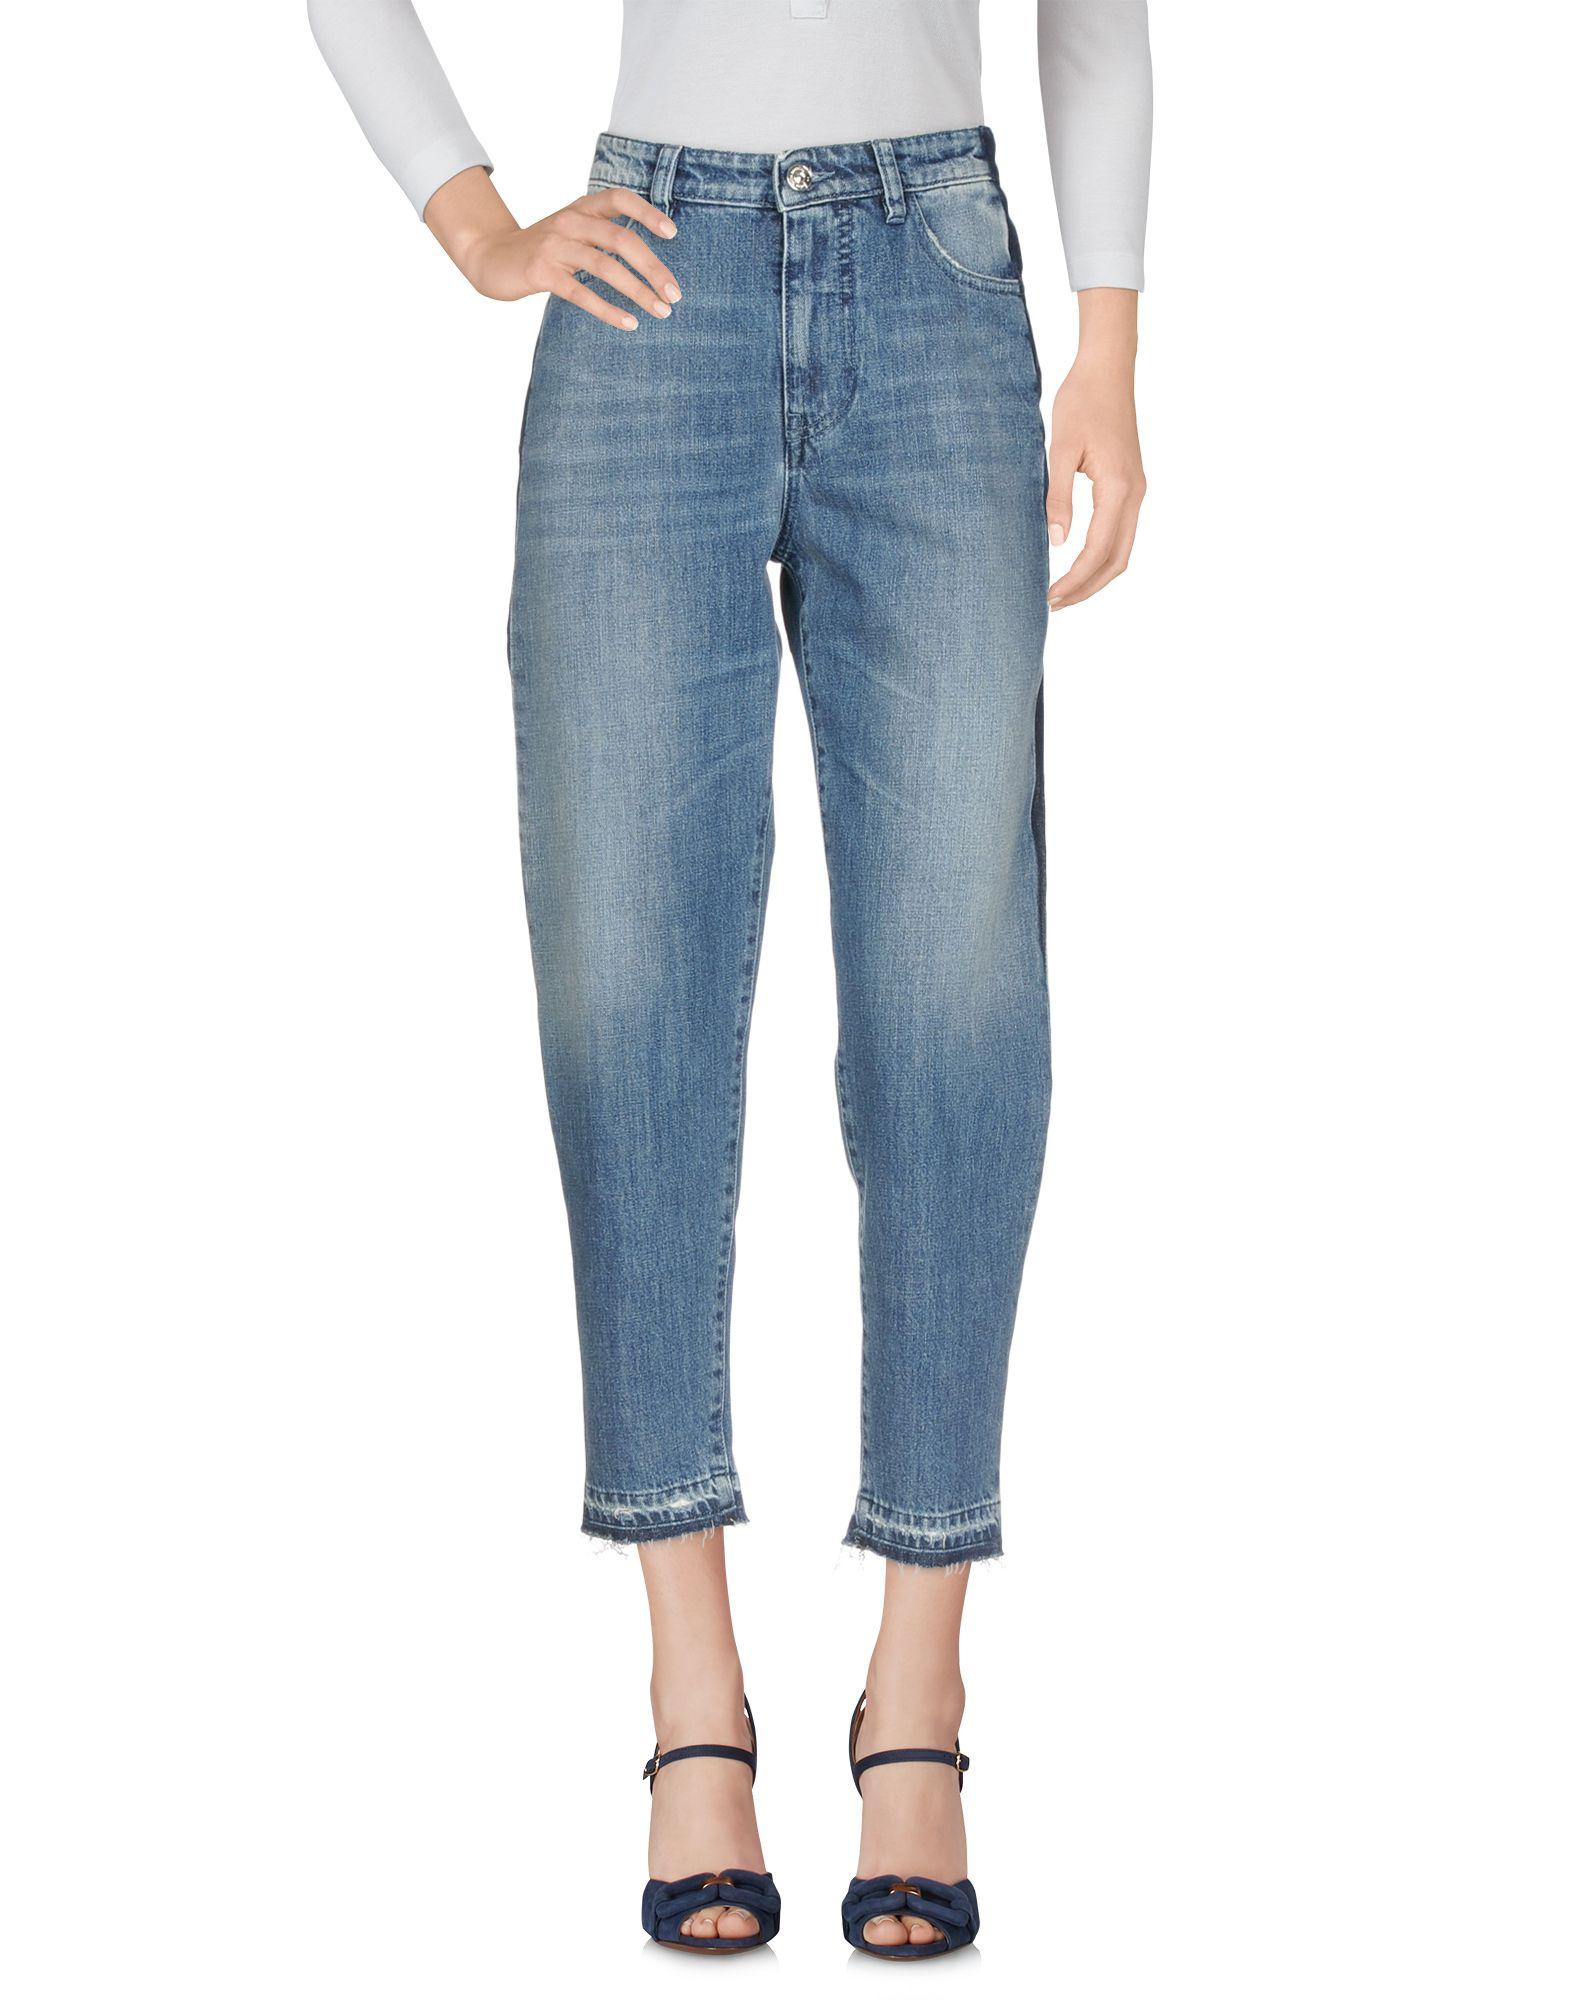 Pantaloni Jeans Nine:Inthe:Morning Donna - Acquista online su 7d8QDeIZvJ